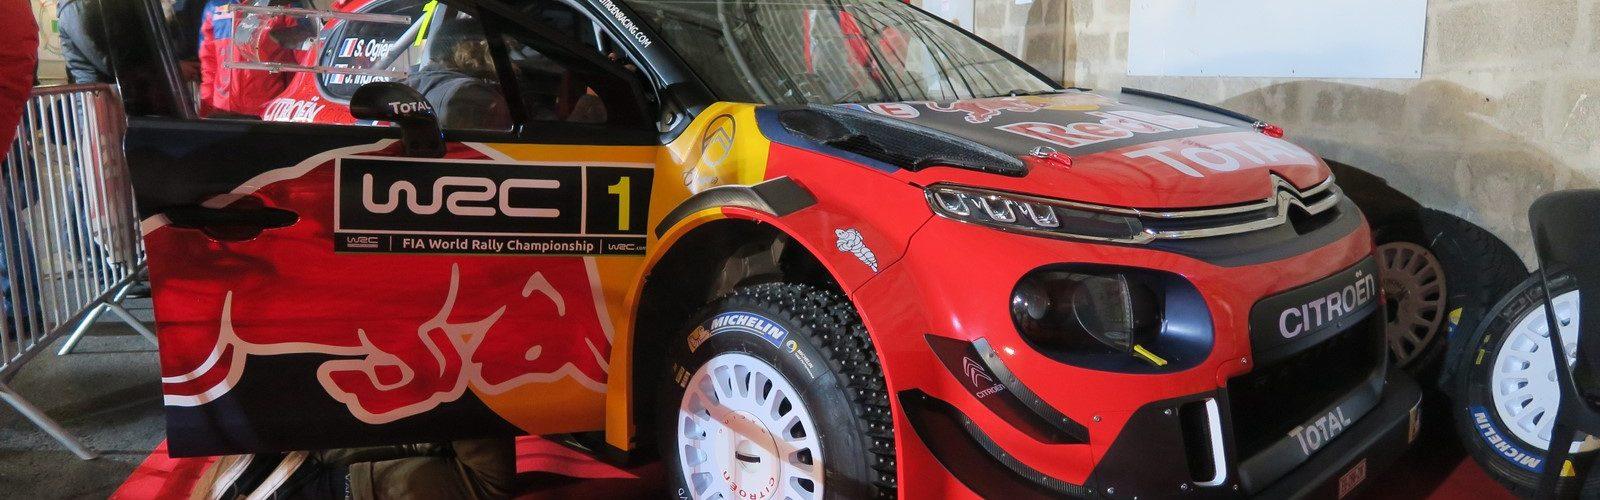 Citroen C3 WRC Sebastien Ogier 2019 LNA FM 59